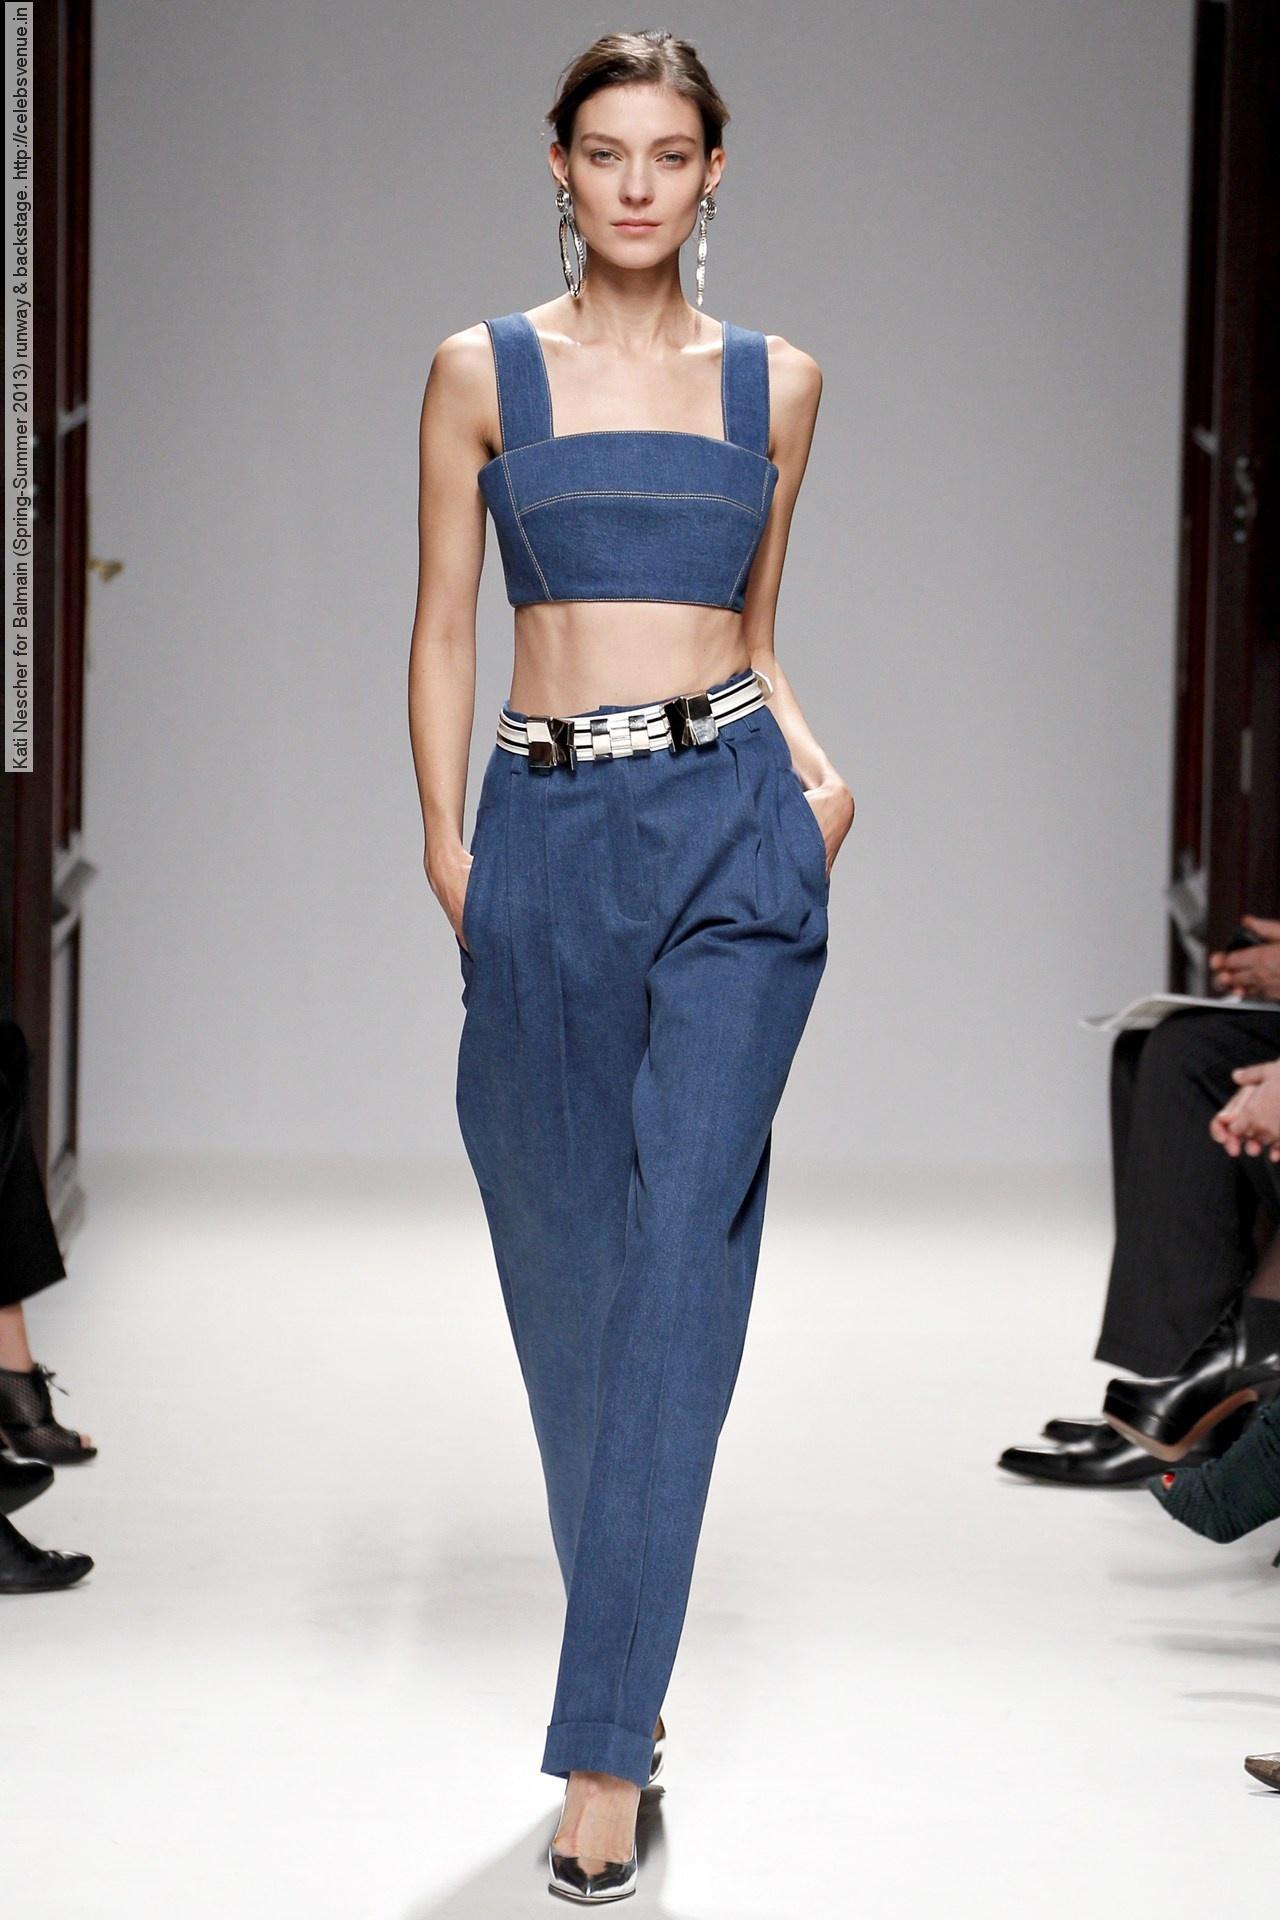 Kati Nescher for Balmain (Spring-Summer 2013) runway & backstage